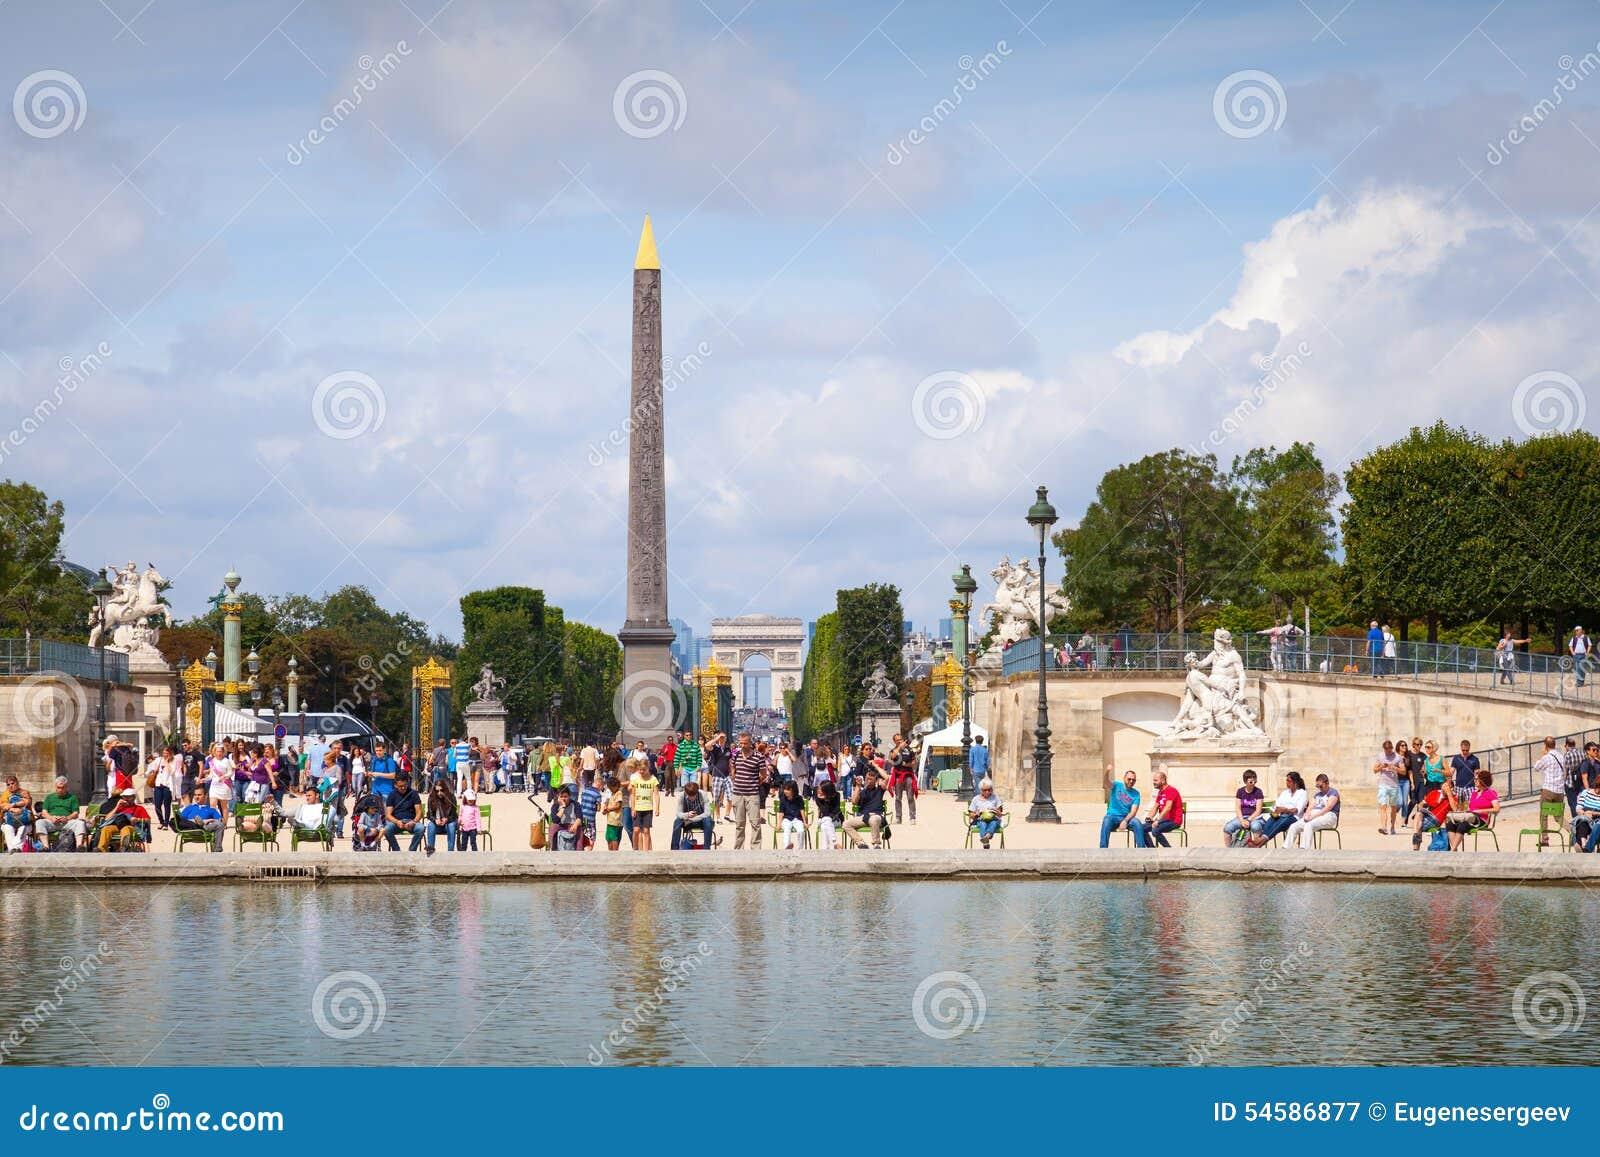 Pond in jardin des tuileries with walking tourists for Jardin de france